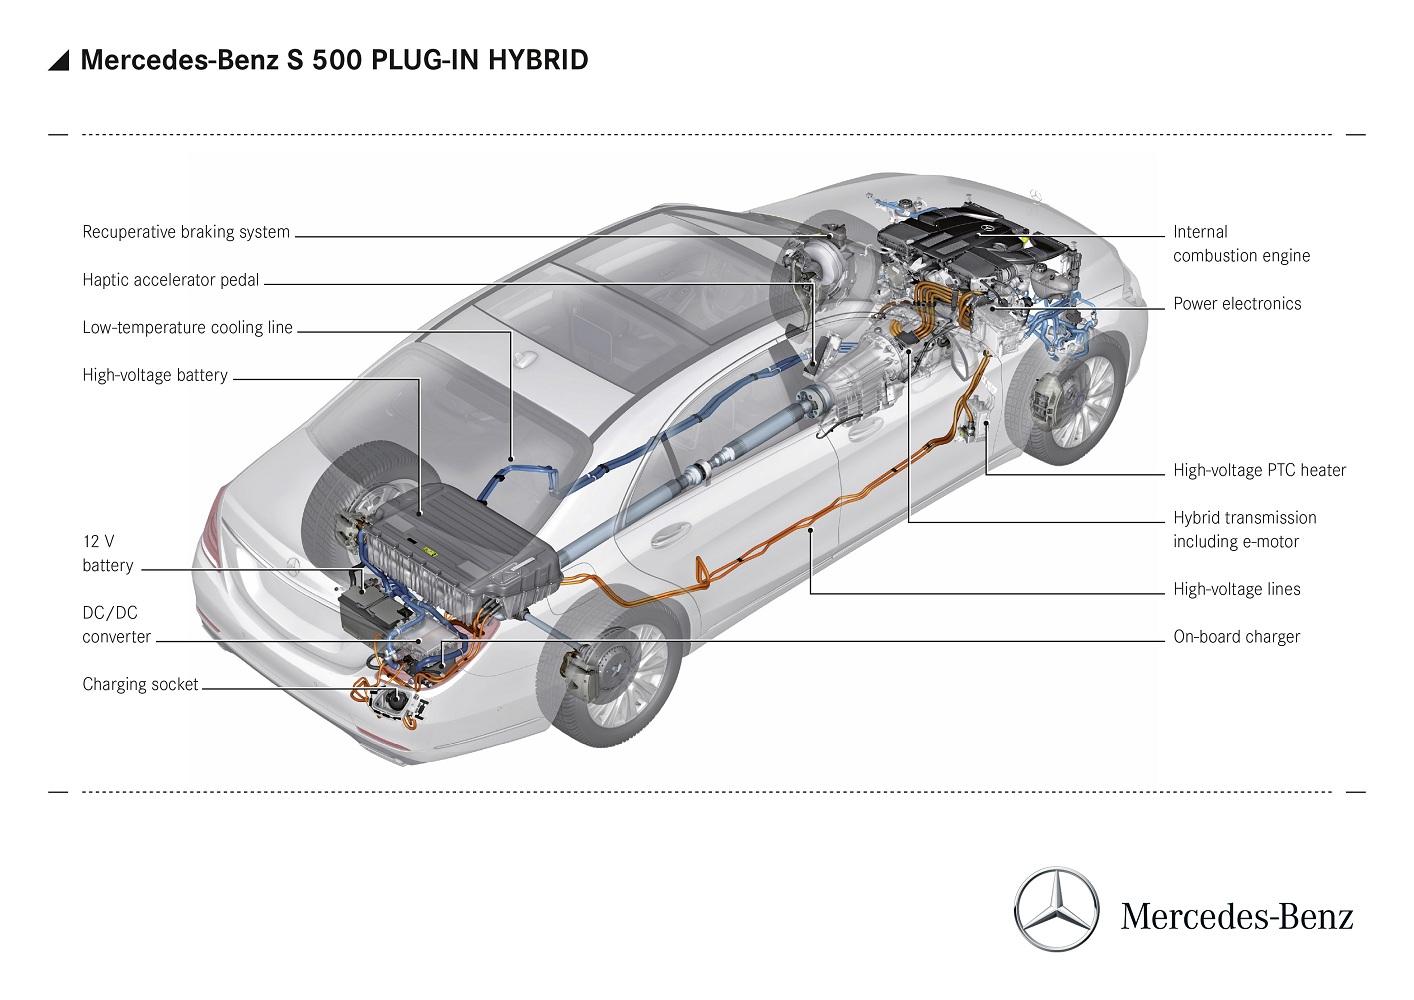 medium resolution of mercedes engine diagram mercedes image wiring the new mercedes s 500 plug in hybrid on mercedes